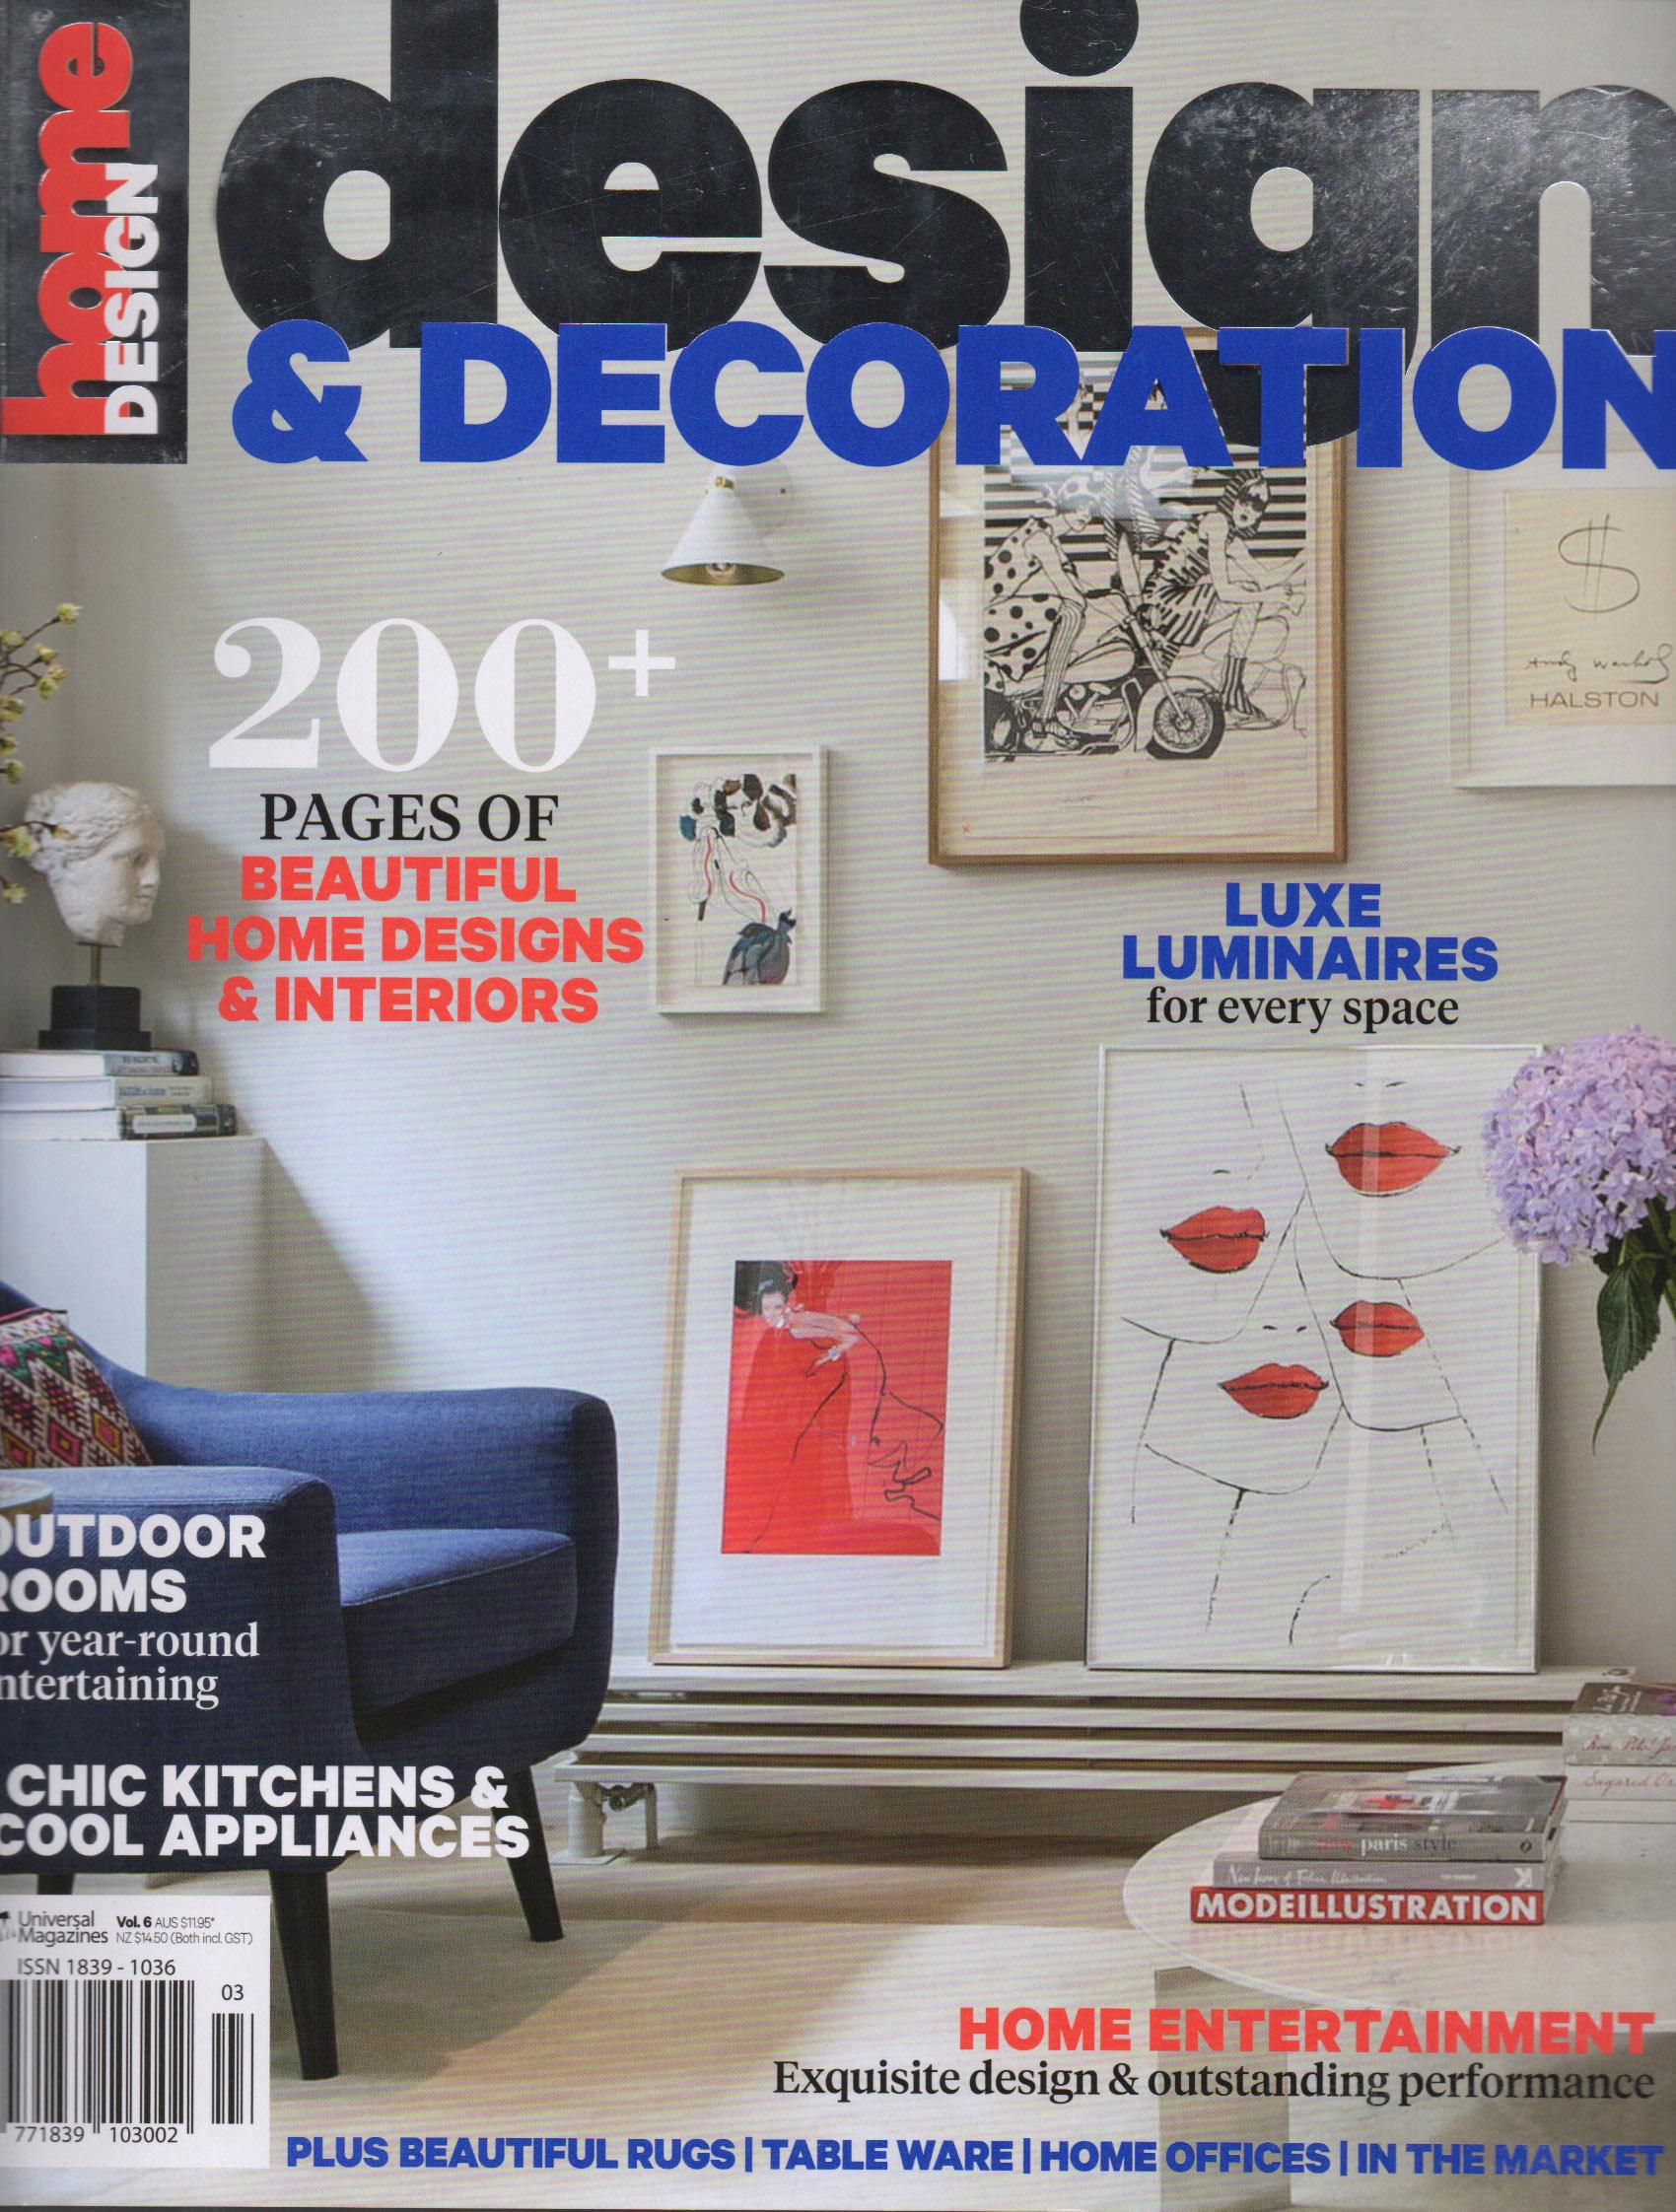 Ilanel - HomeDesign-Design&Decoration - Vol 6 - Cover.jpg